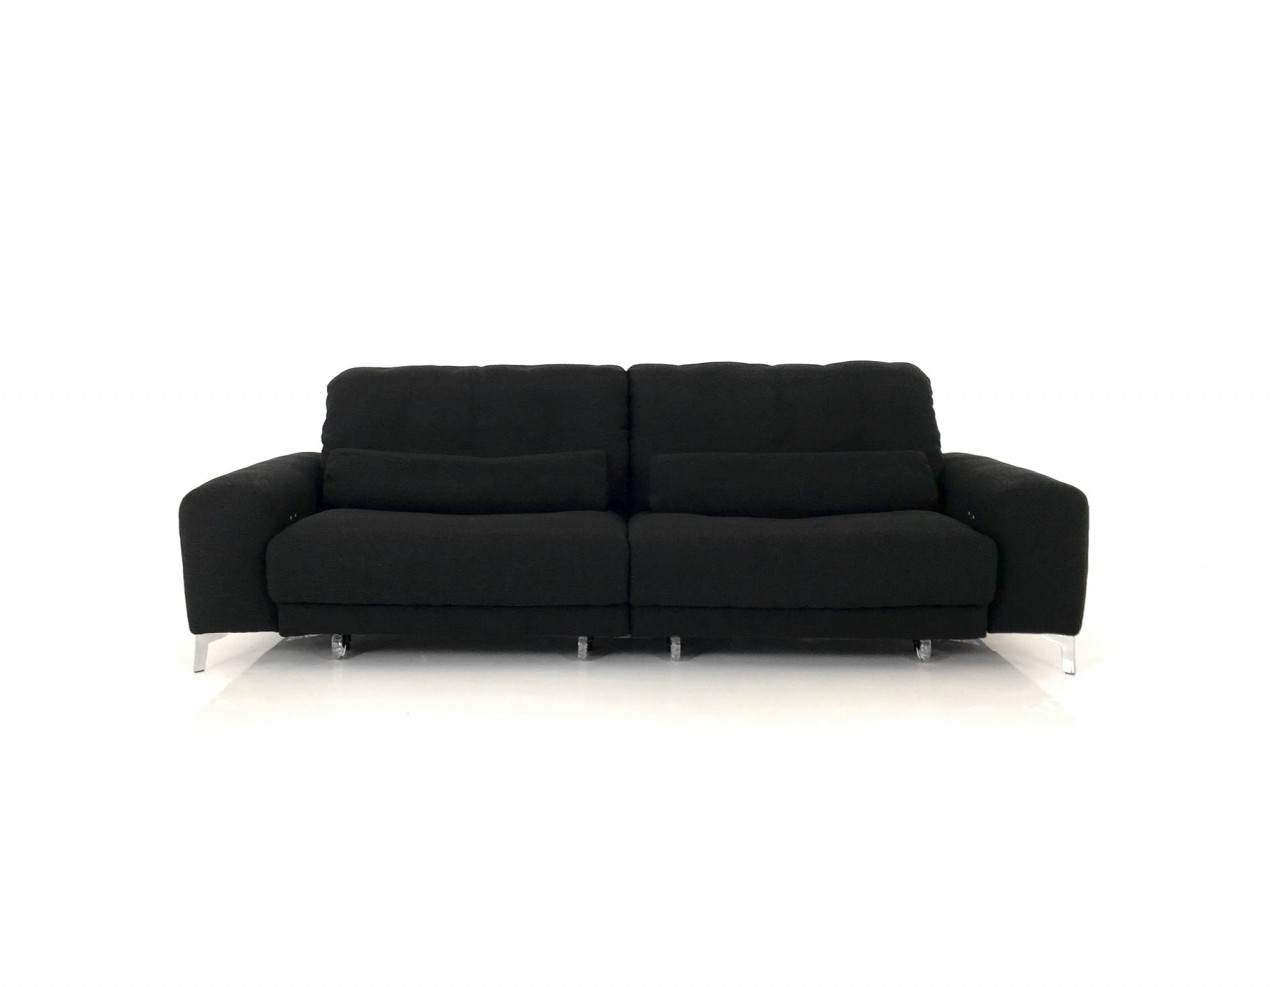 e schillig gladiola plus sofa mit beidseitigen motorsitzvorzug in stoff farbe 25 black. Black Bedroom Furniture Sets. Home Design Ideas